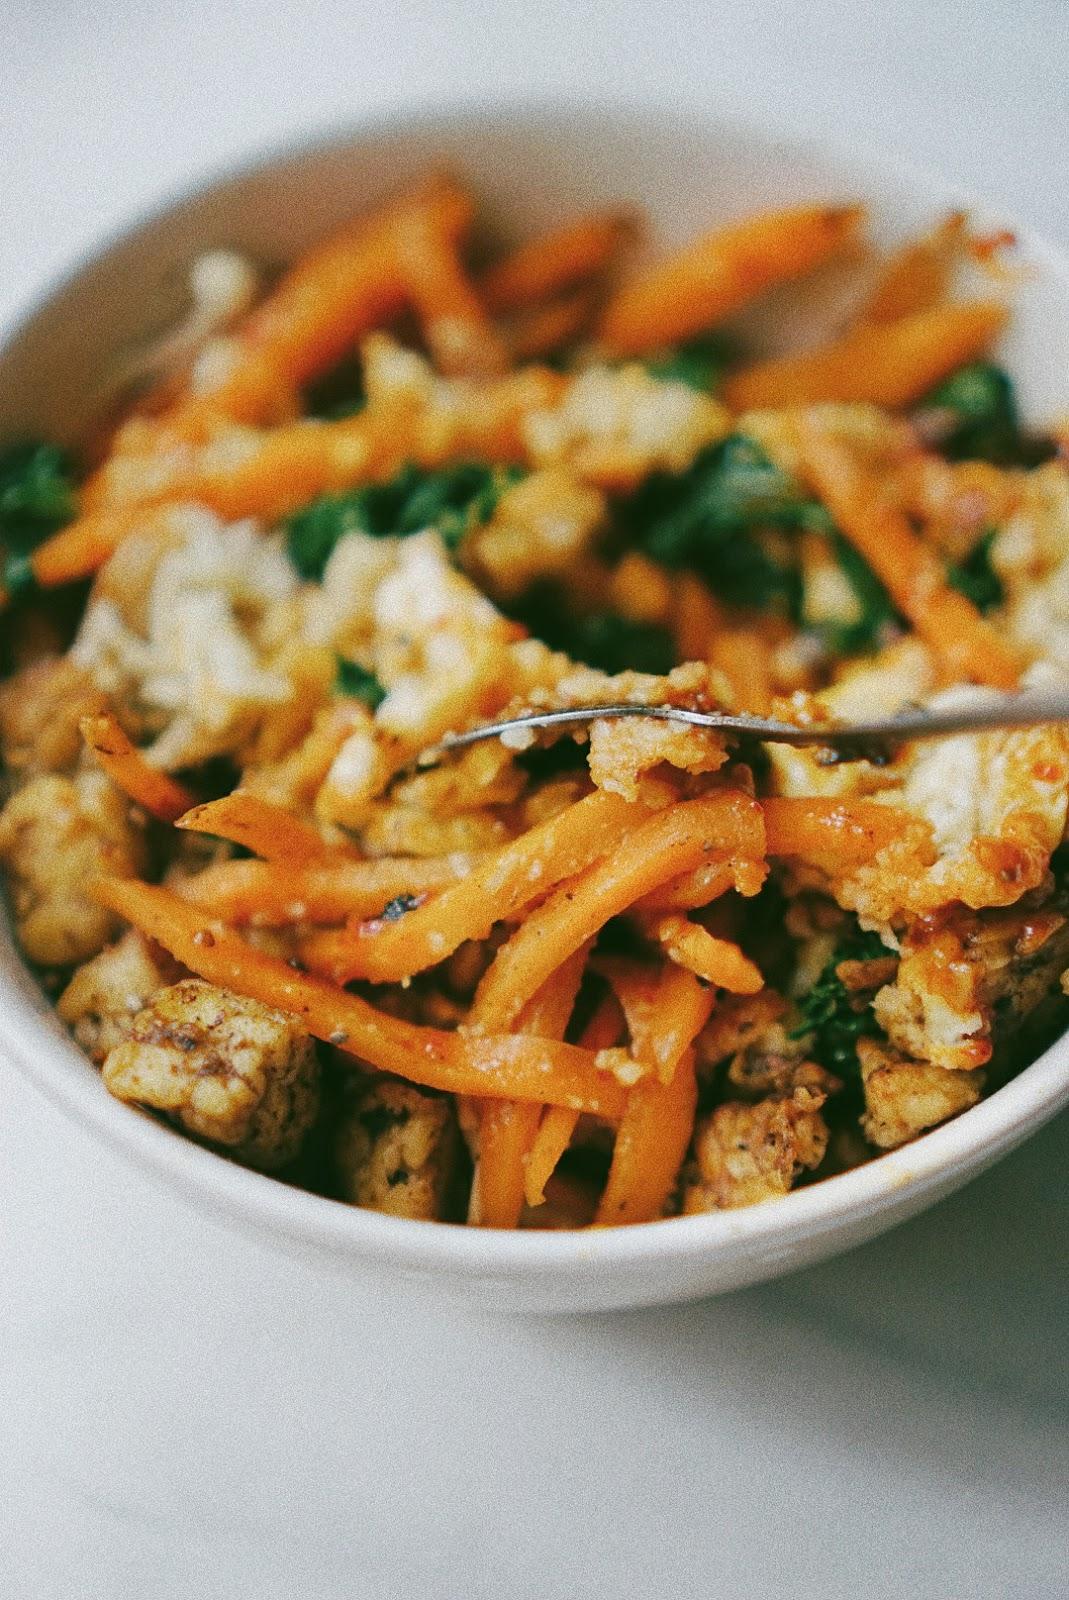 Resep Bibimbab with Cauliflower Rice - Yummy